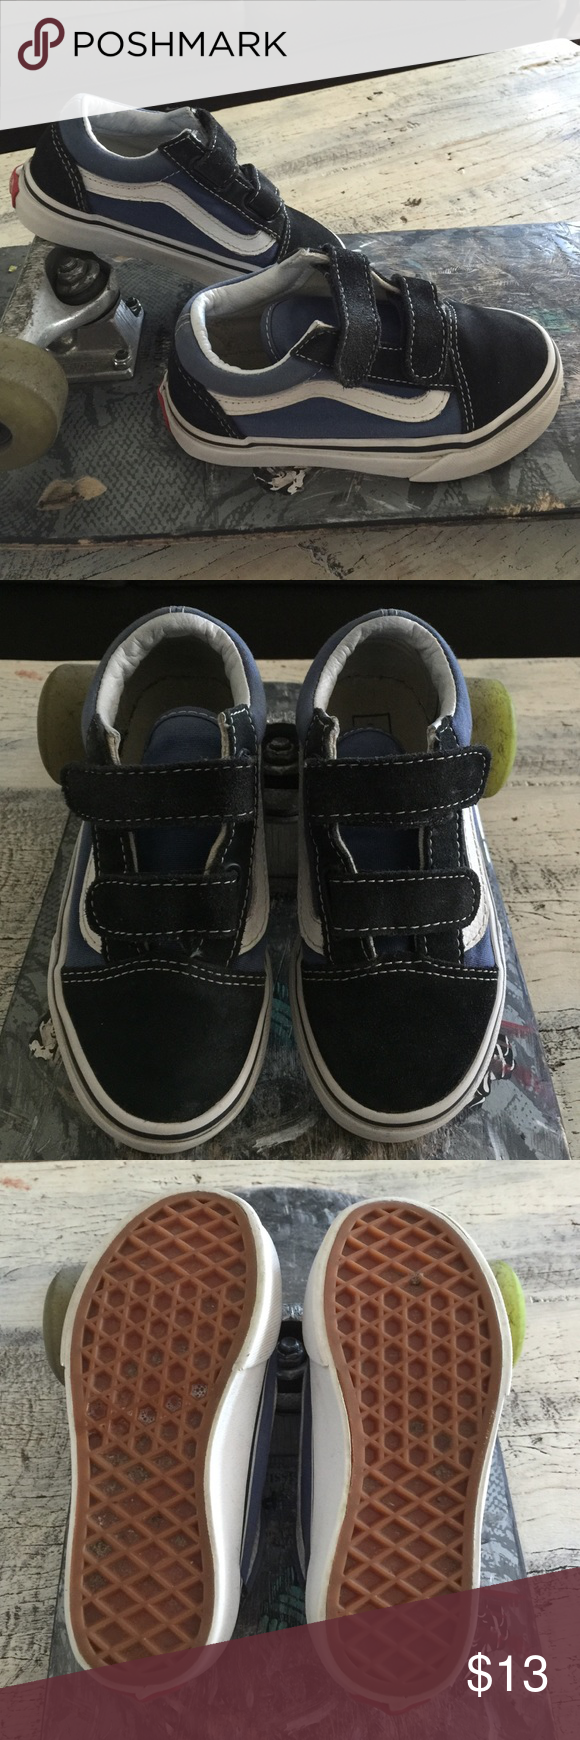 Old Skool Velcro Shoe Youth